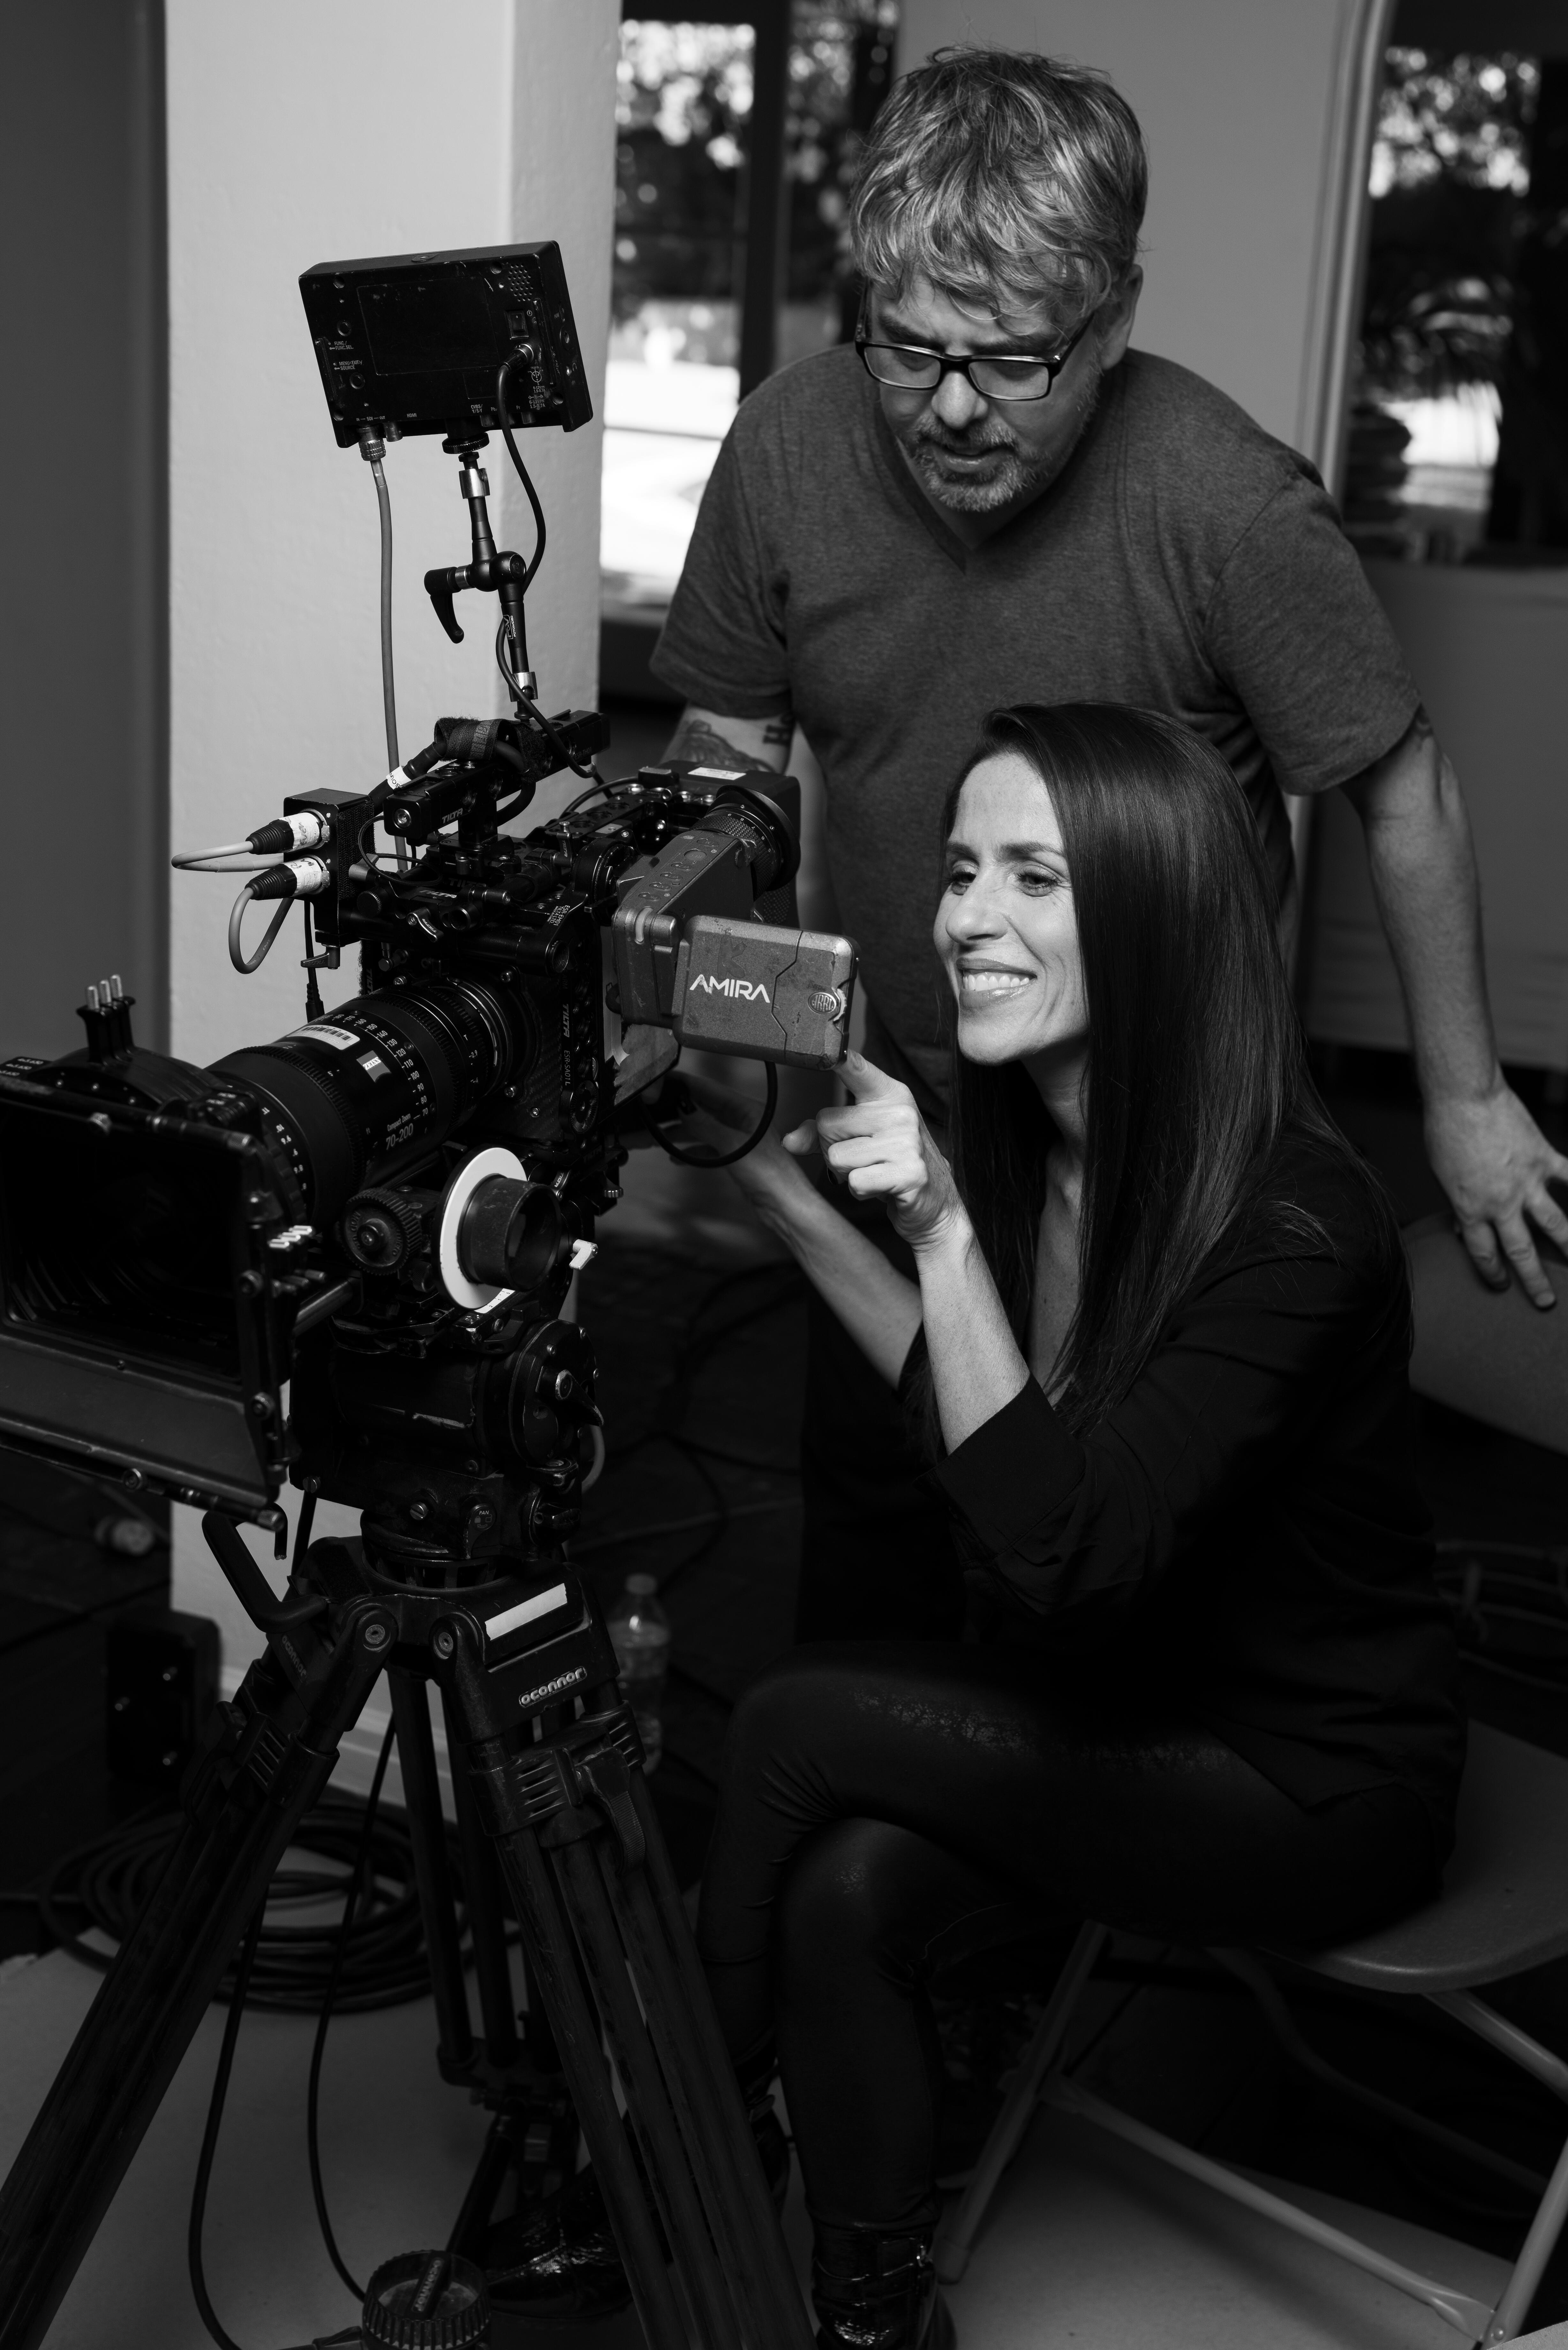 Filmmaker Soleil Moon Frye in a recent photo